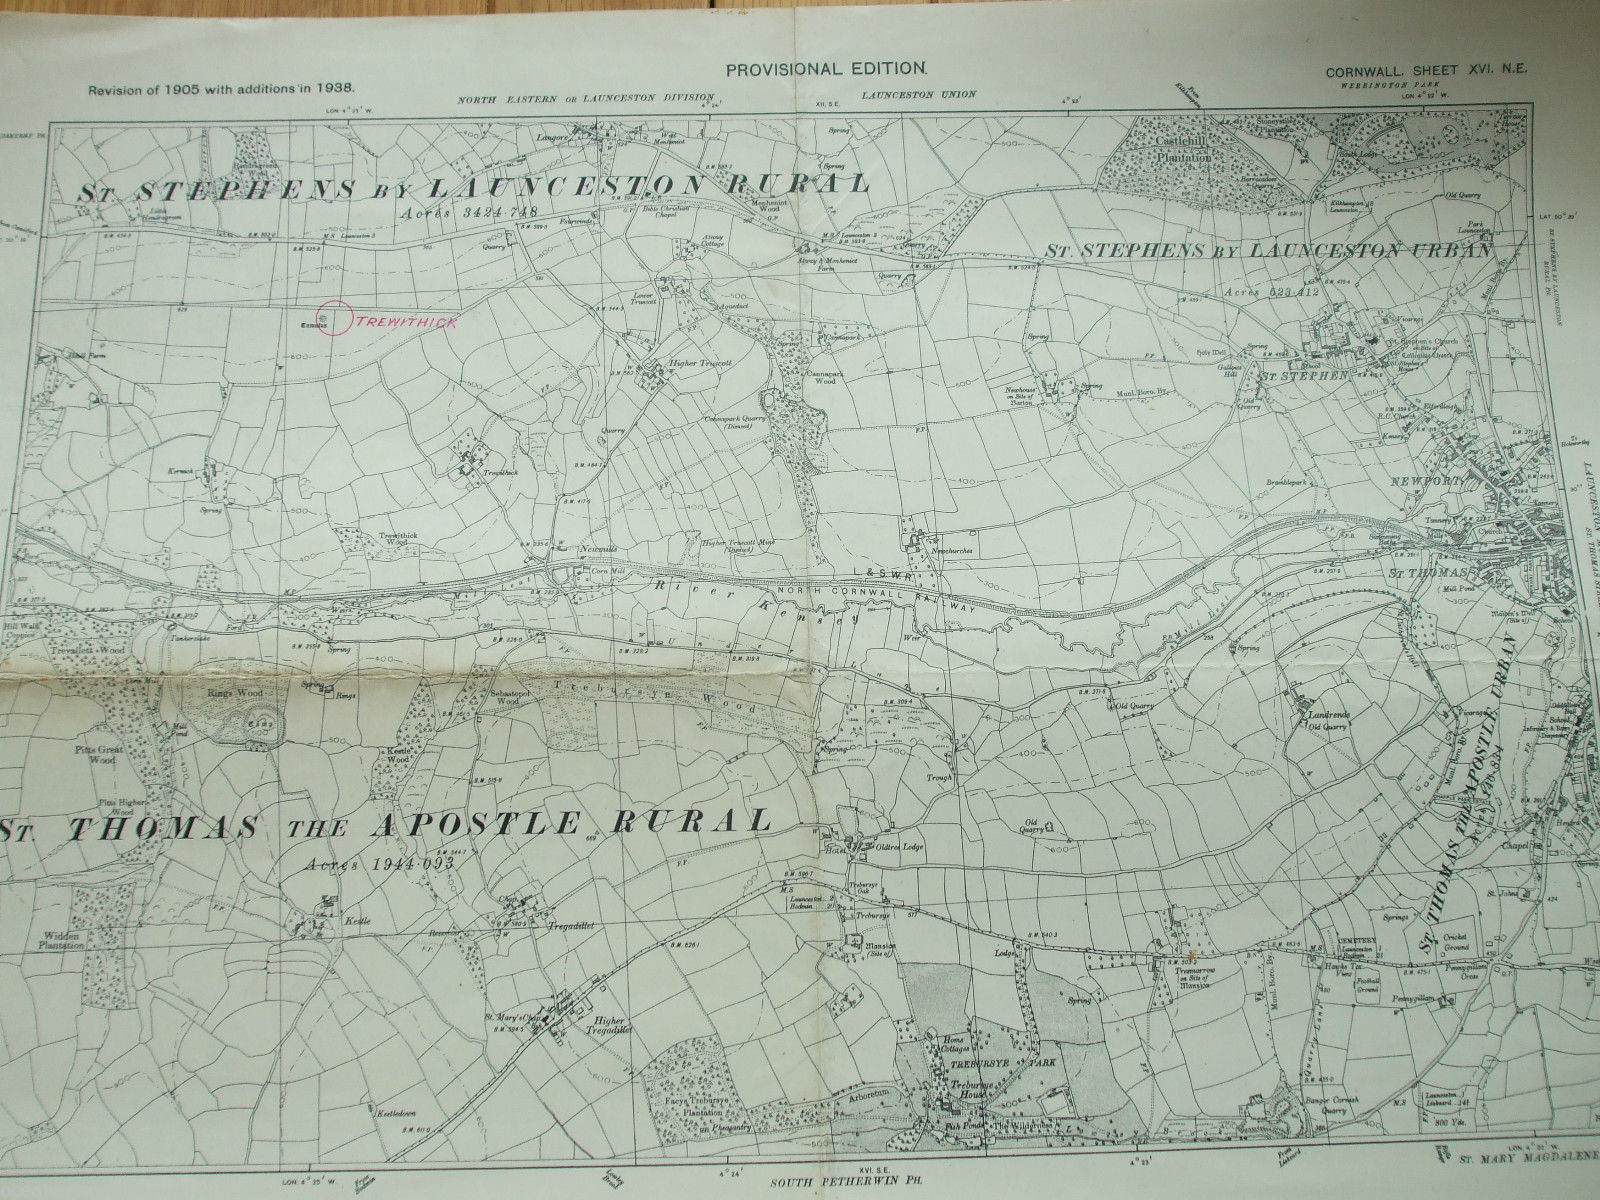 1938-map-of-st-thomas